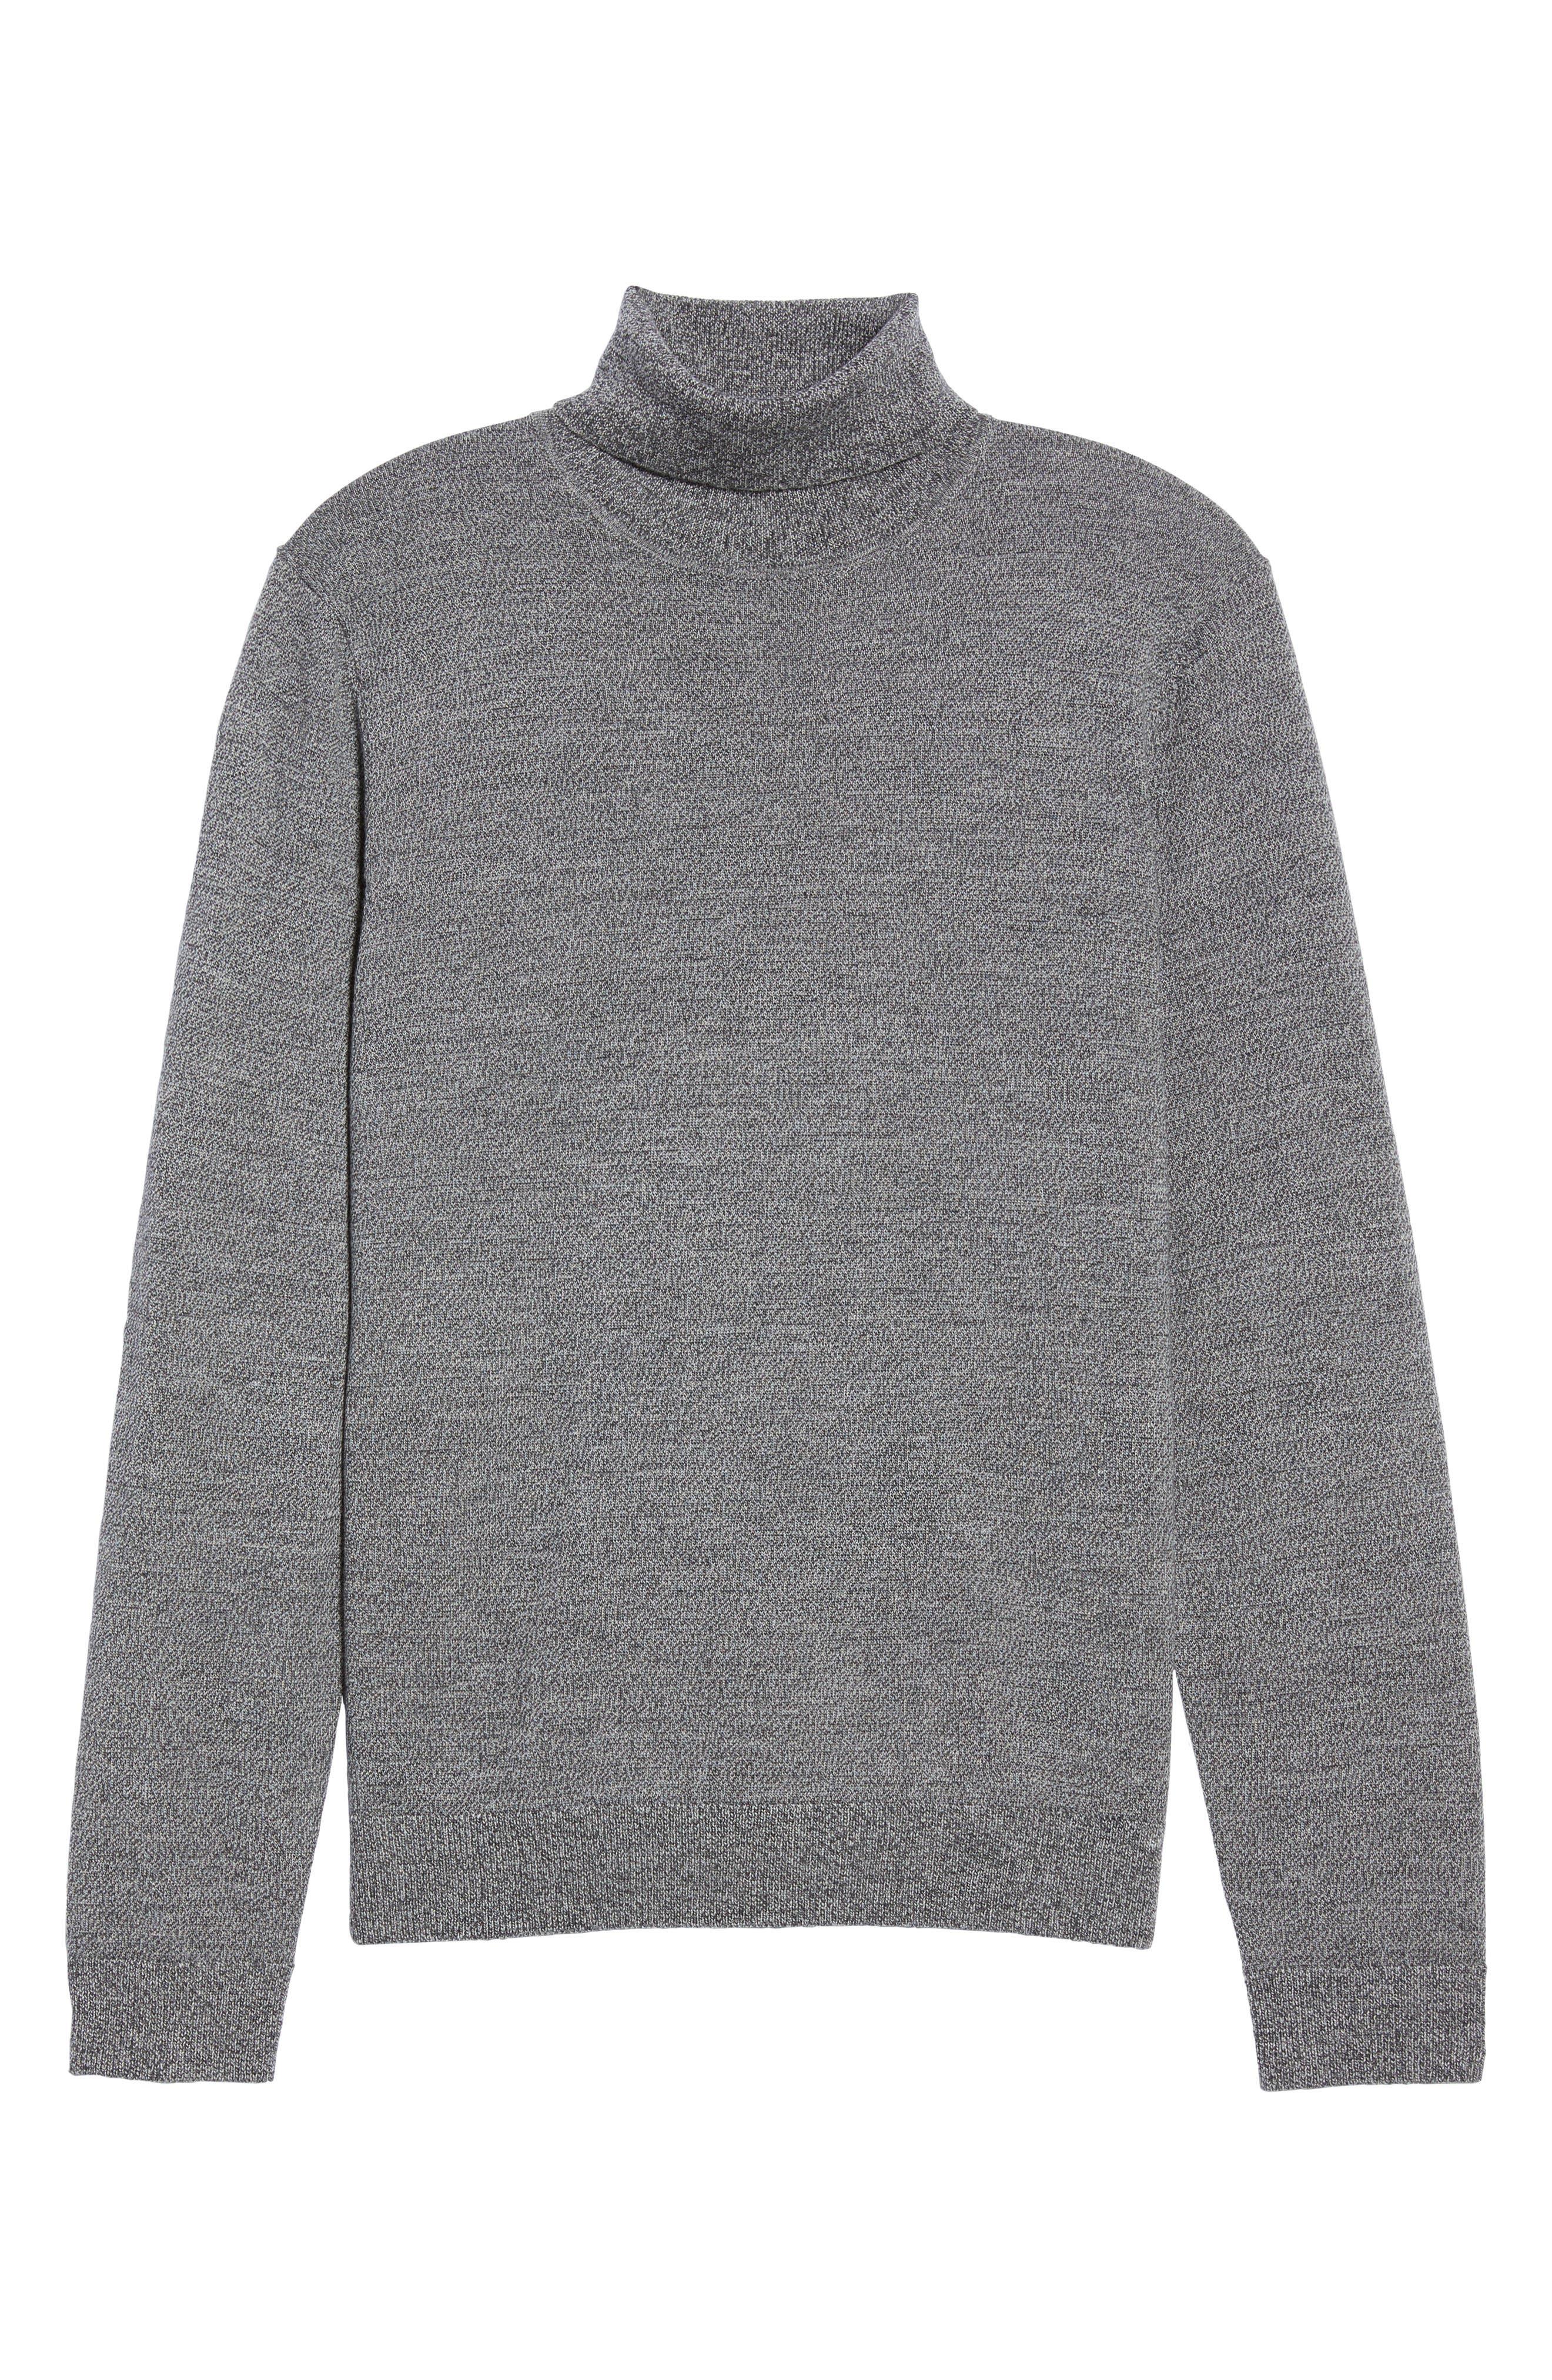 Merino Wool Turtleneck Sweater,                             Alternate thumbnail 6, color,                             Grey Shade Marl